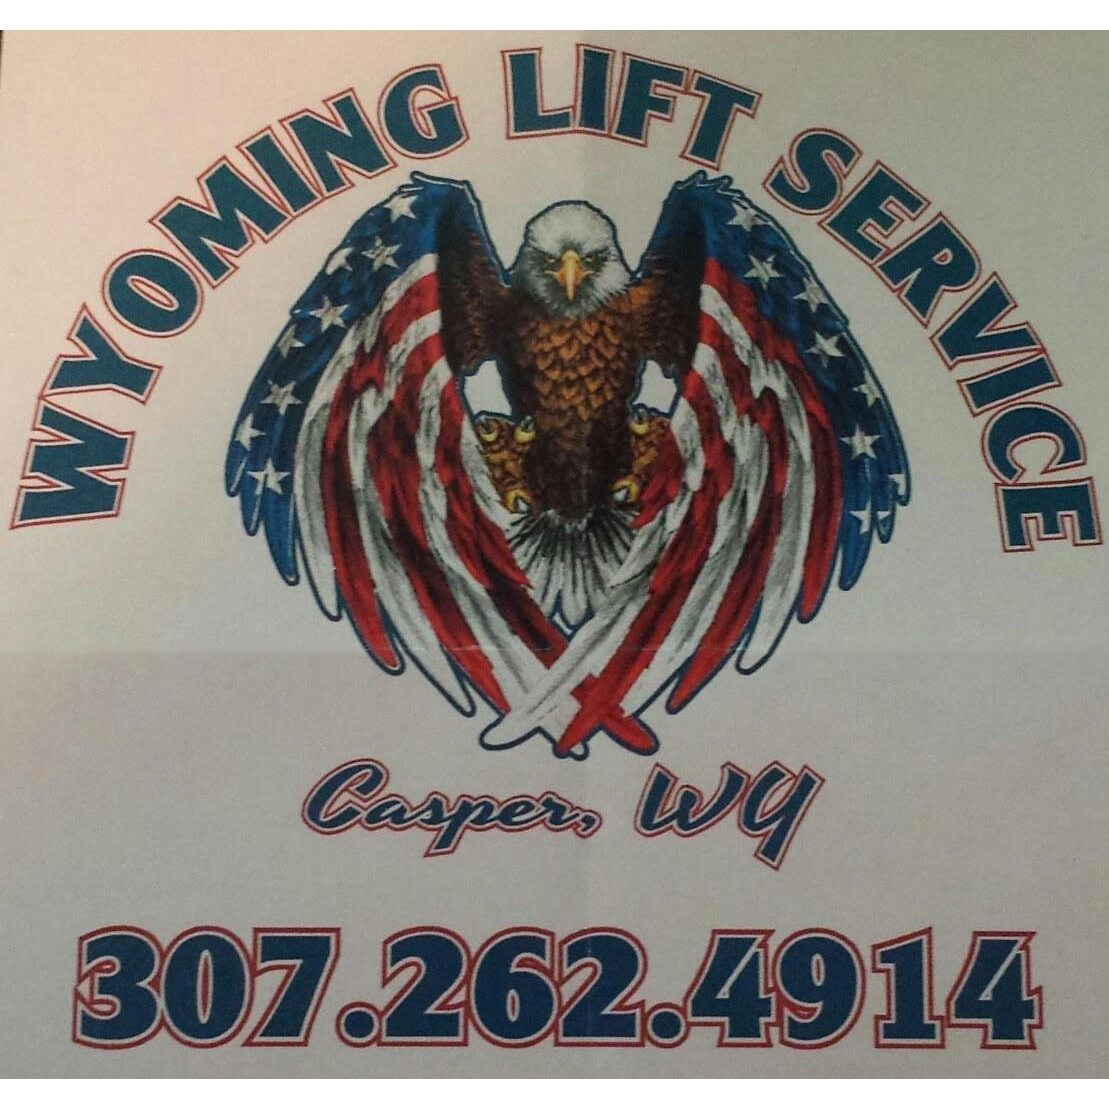 Wyoming Lift Service